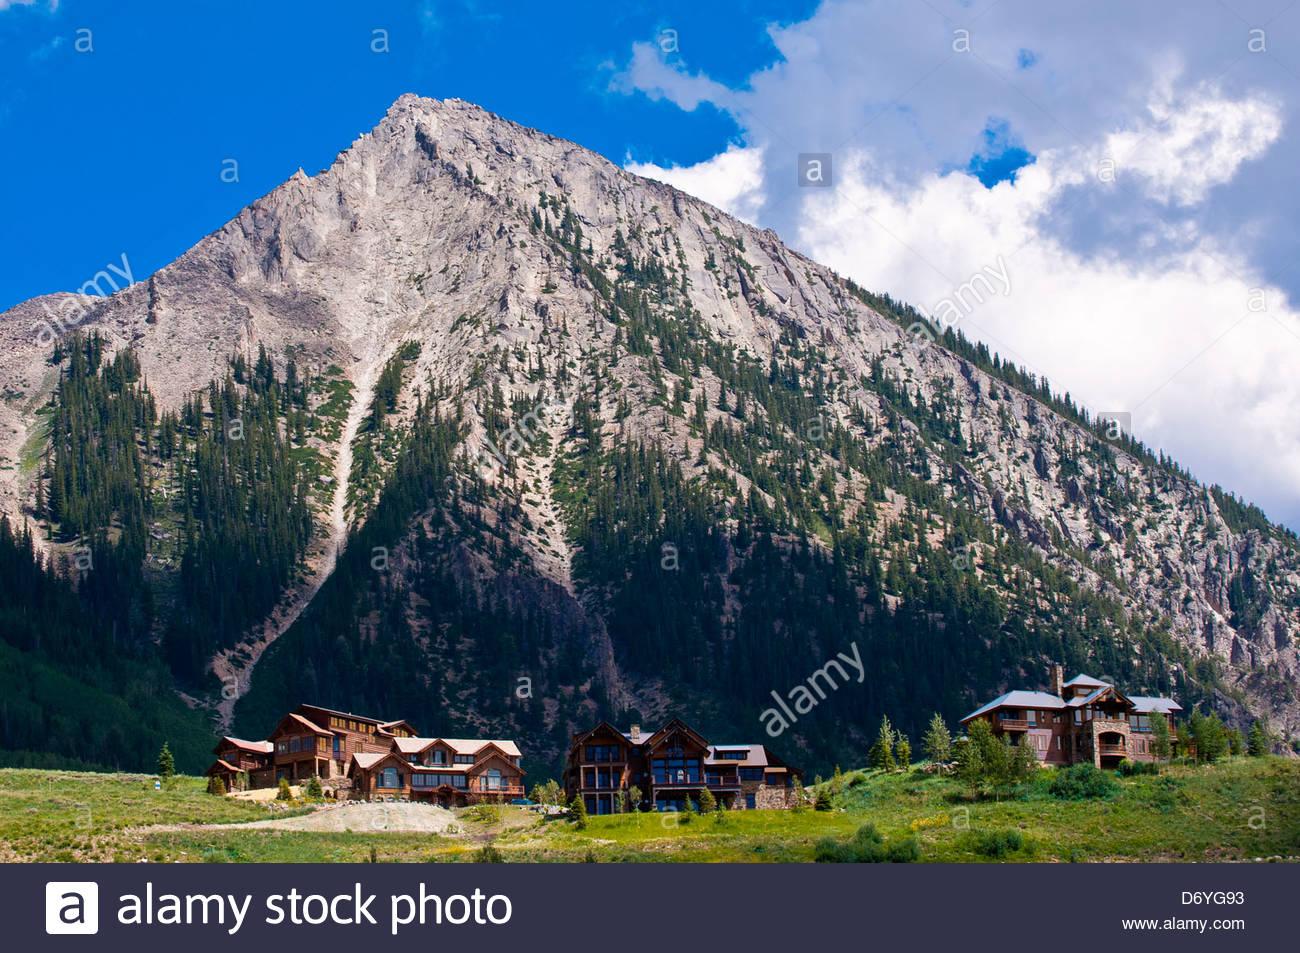 Mt. Crested Butte (ski resort), near Crested Butte, Colorado USA - Stock Image